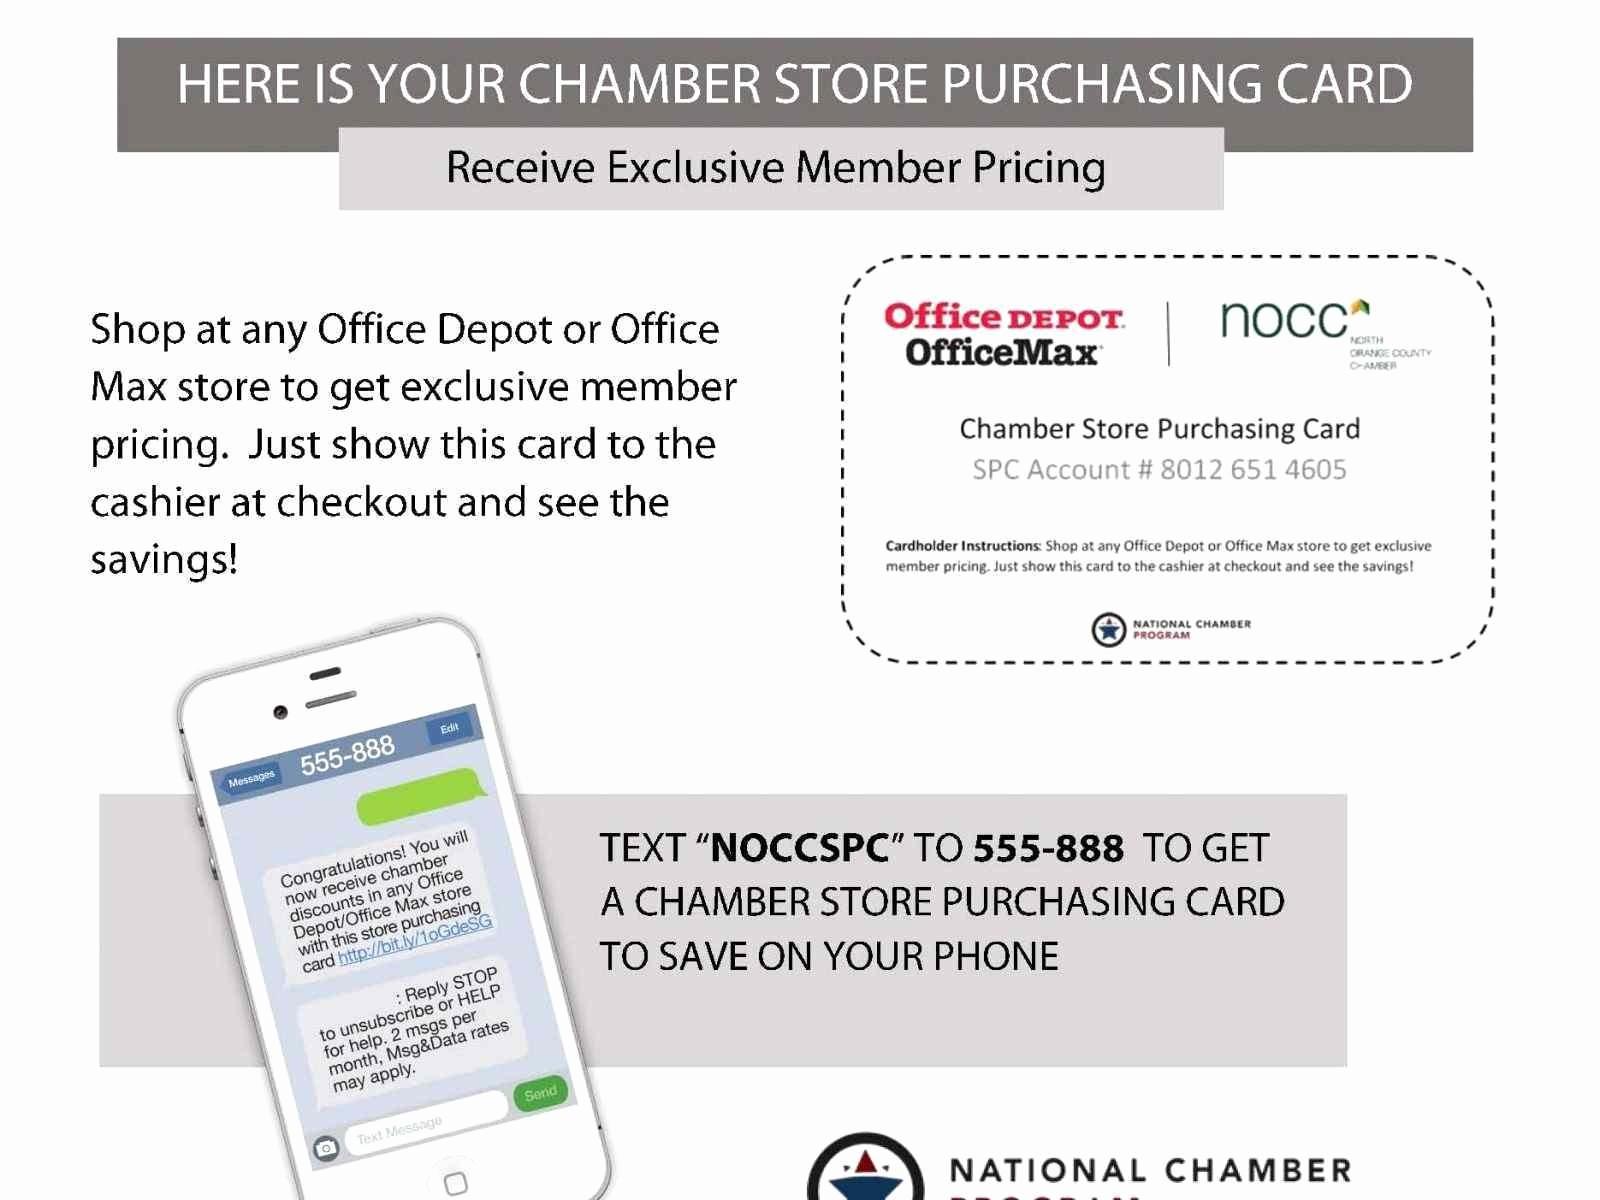 Microsoft Business Card Templates Free Inspirational Microsoft Fice Business Card Templates Free